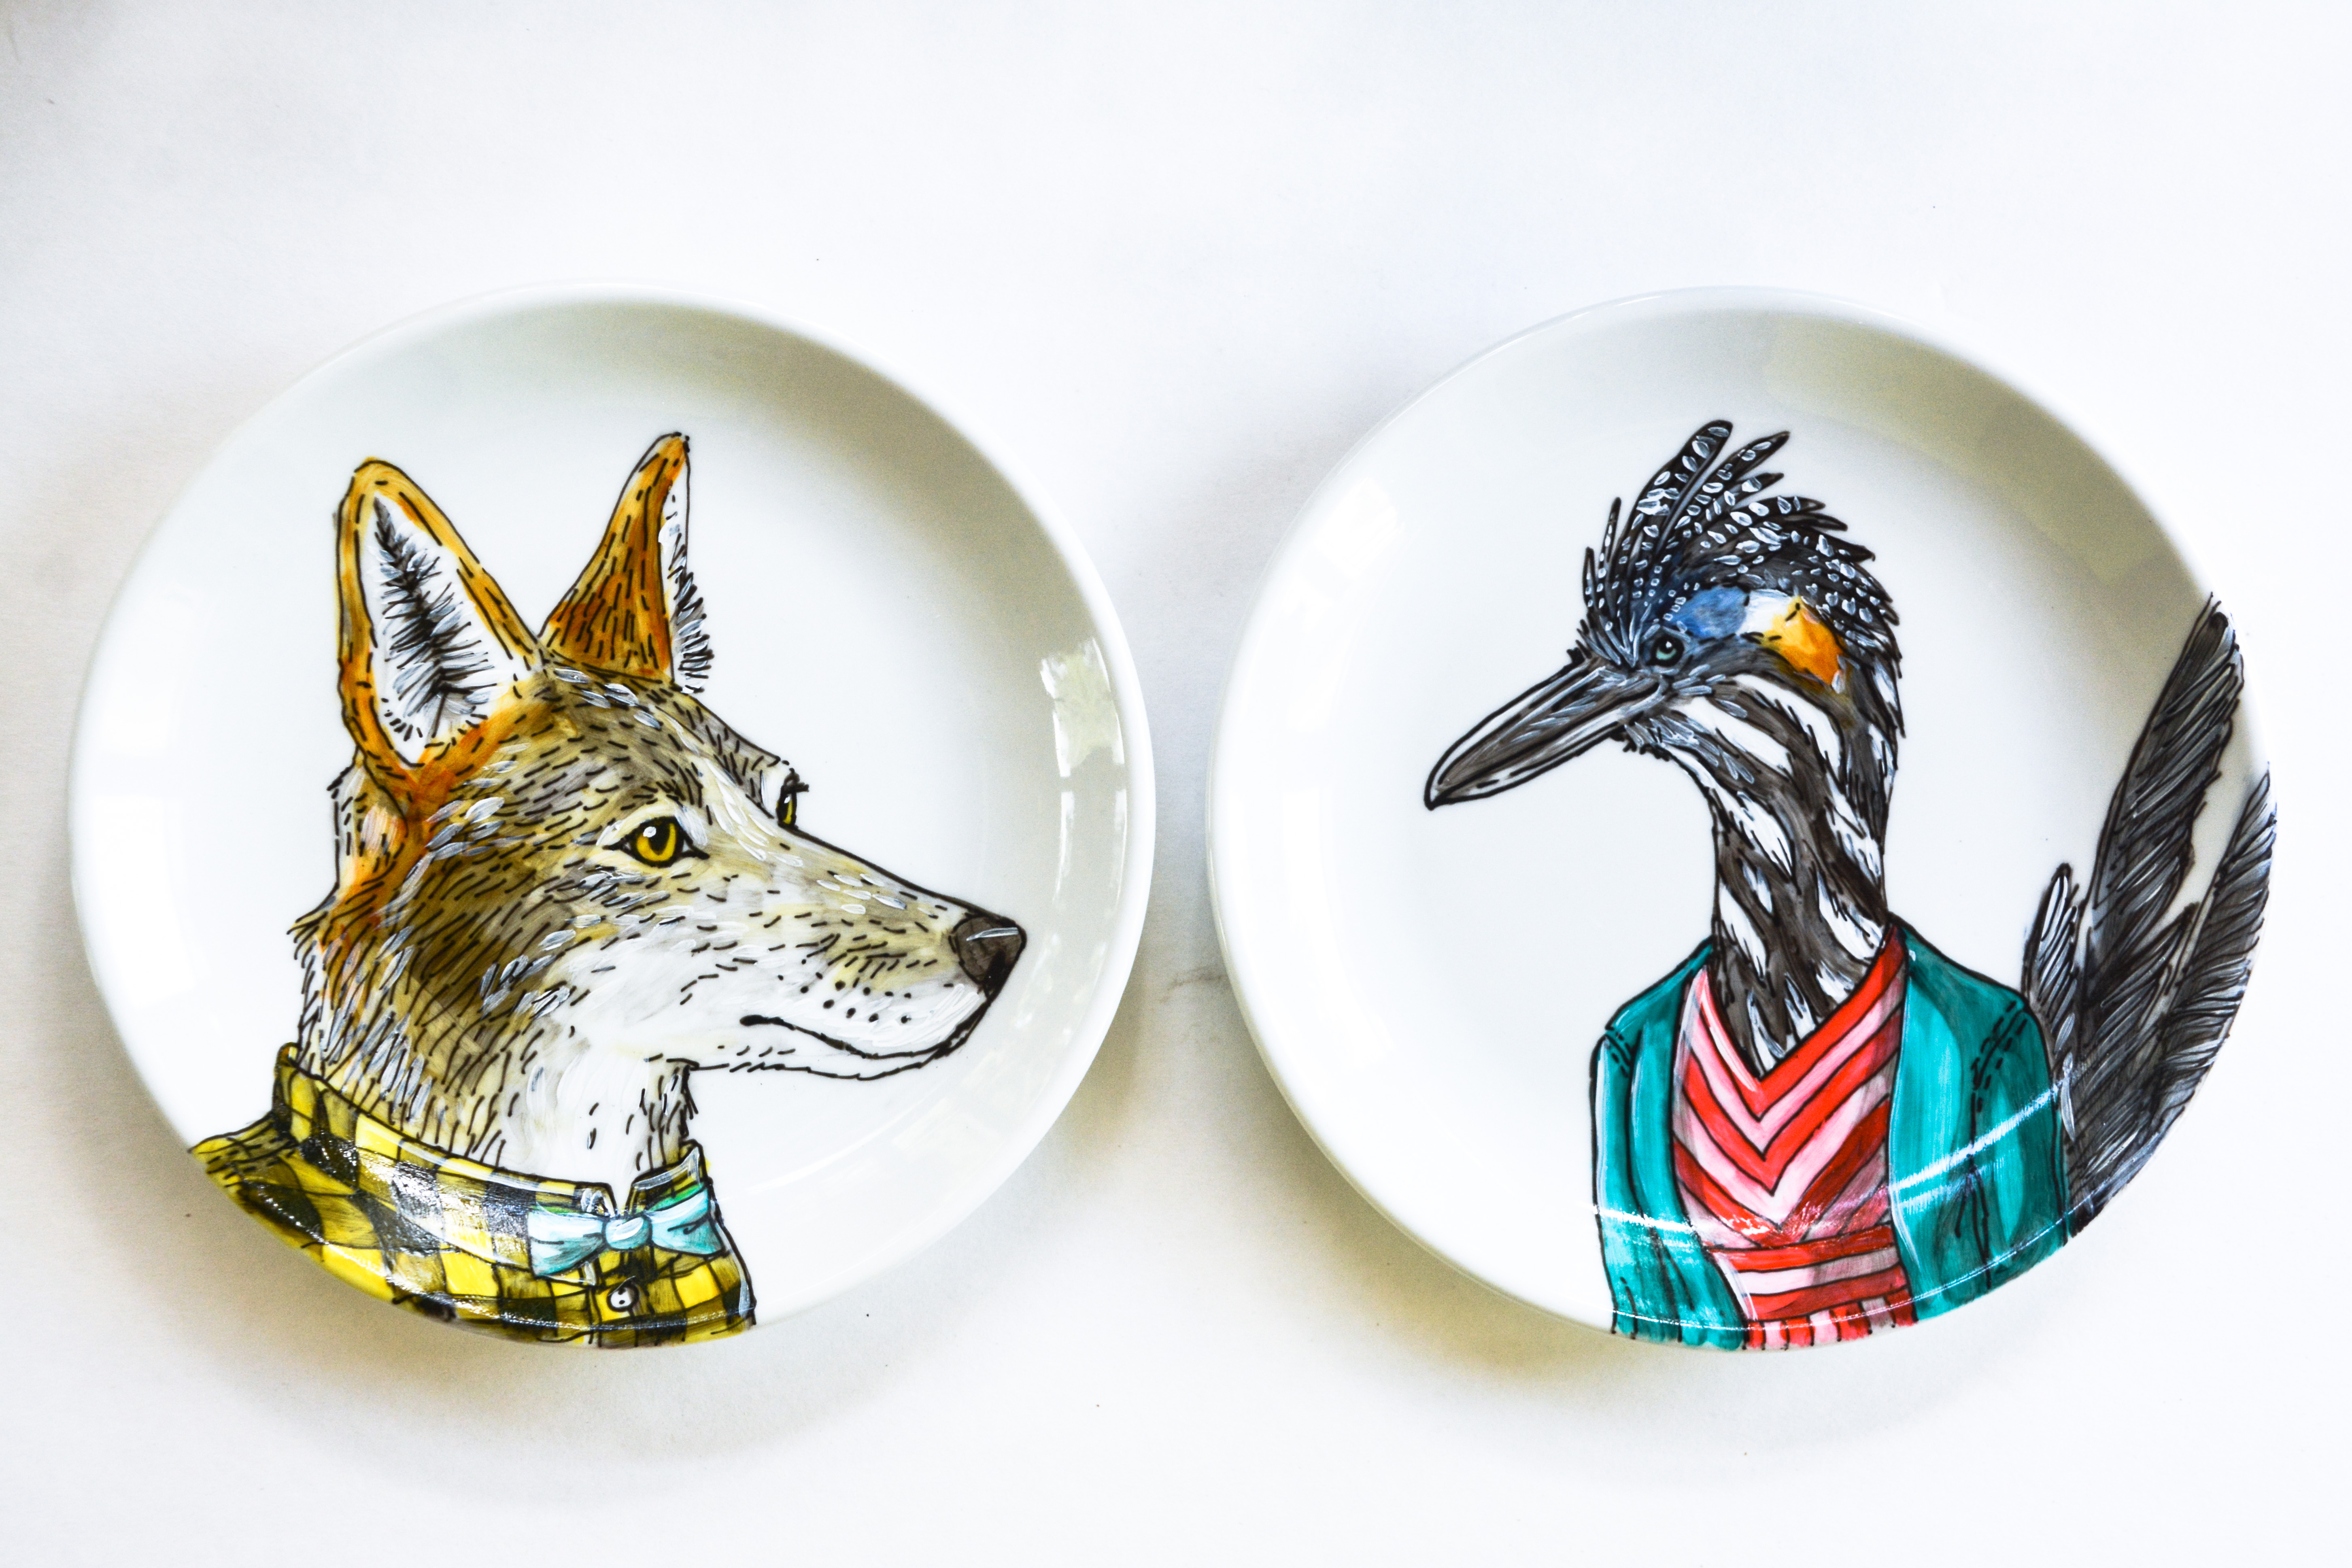 Coyote + Roadrunner